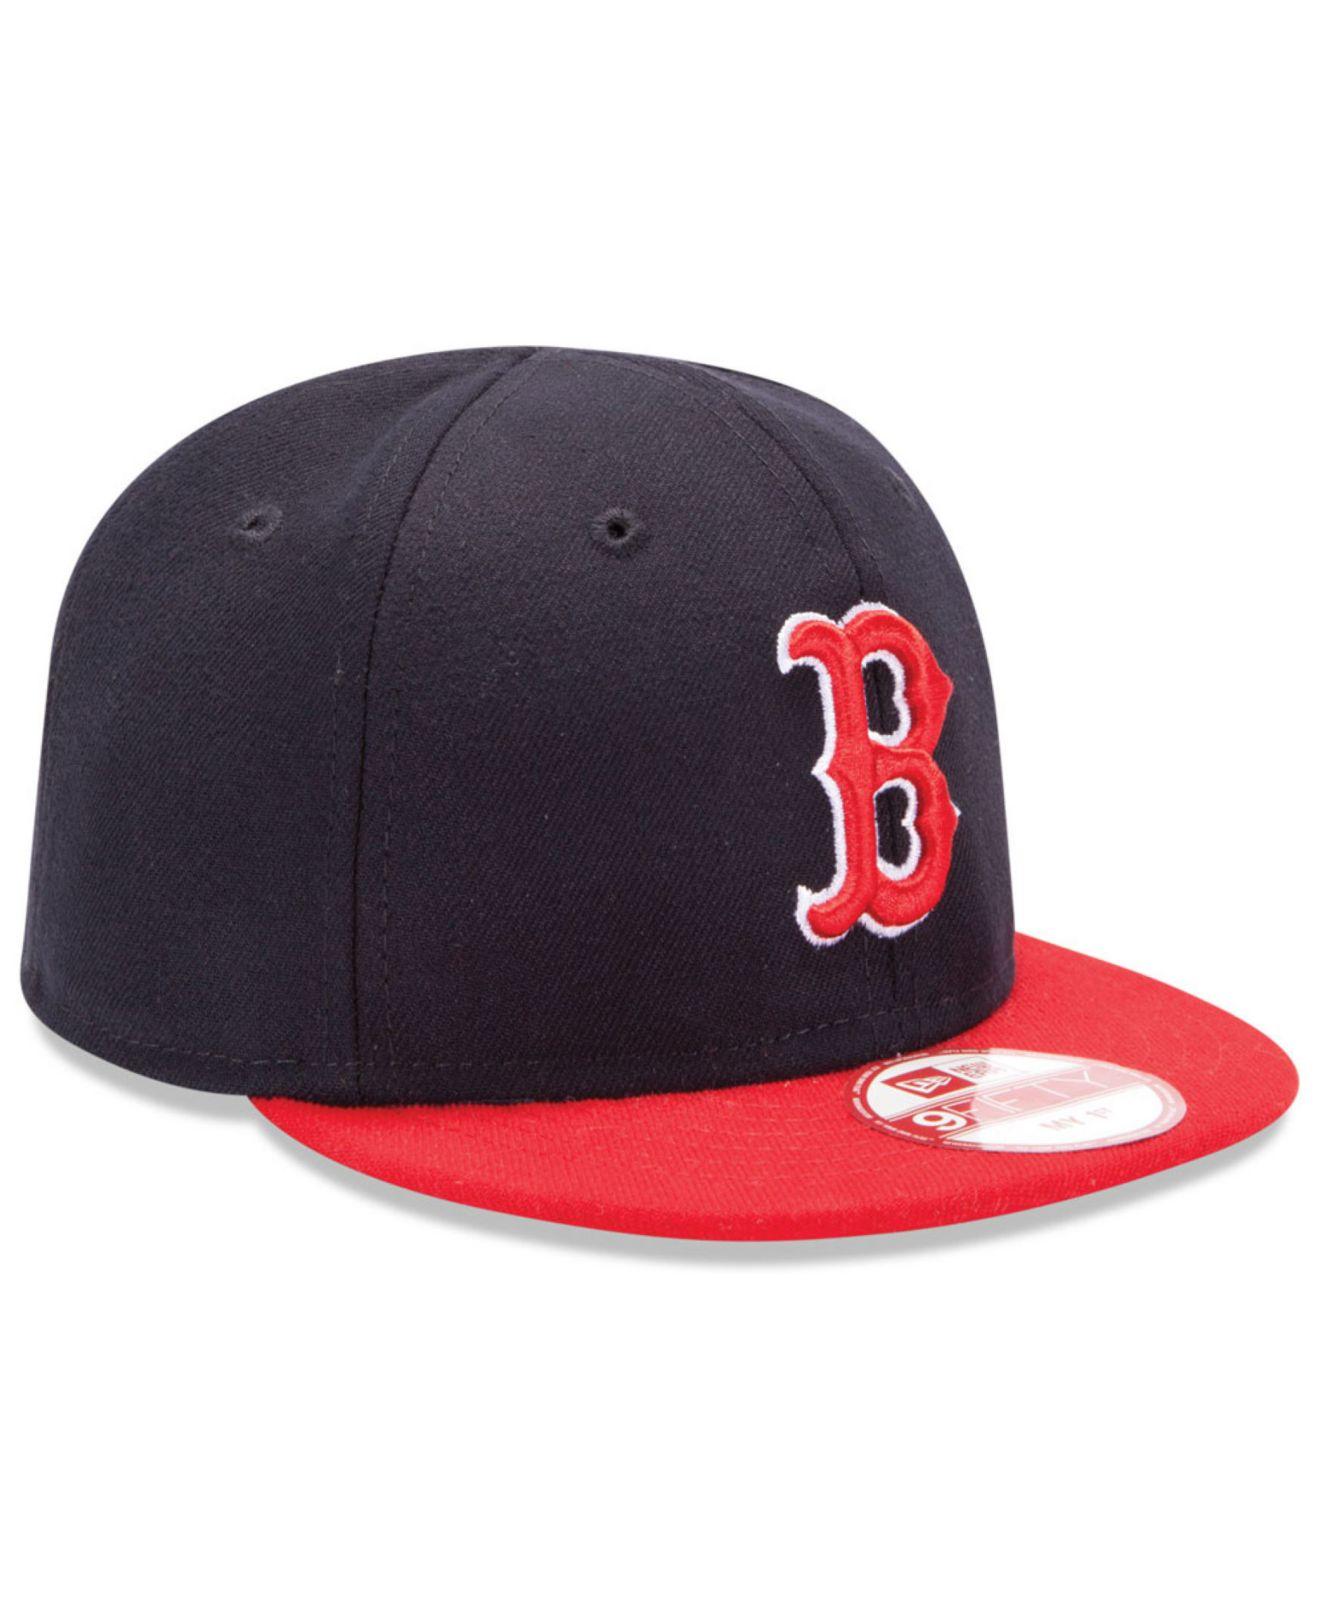 d26ef6df4861f9 Lyst - KTZ Babies' Boston Red Sox 9fifty Snapback Cap in Blue